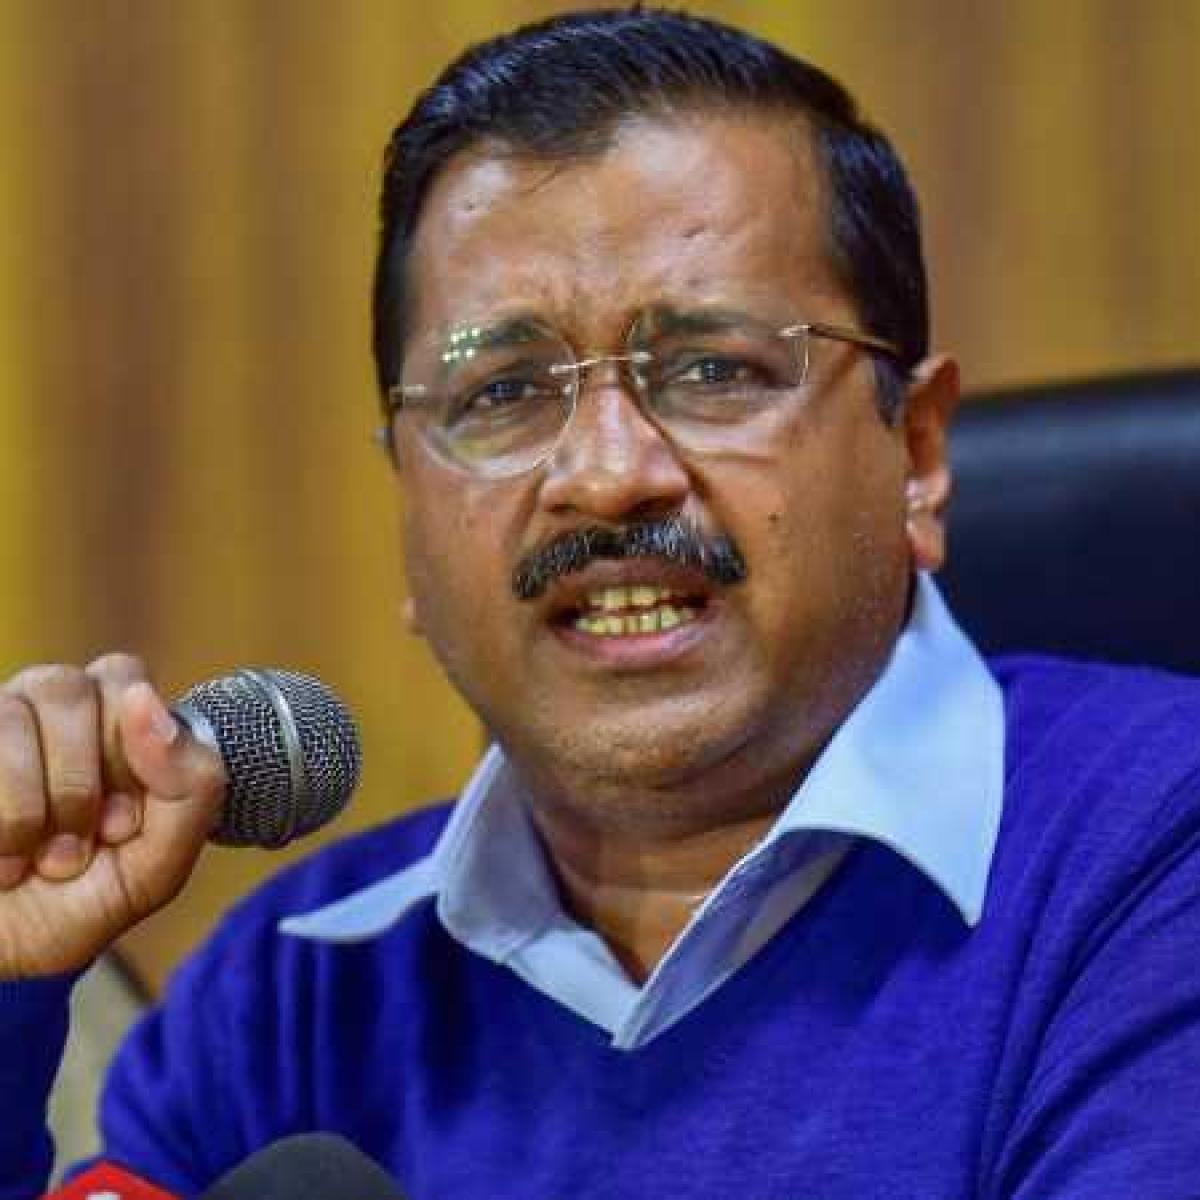 Online services for essential goods to be allowed: CM Arvind Kejriwal